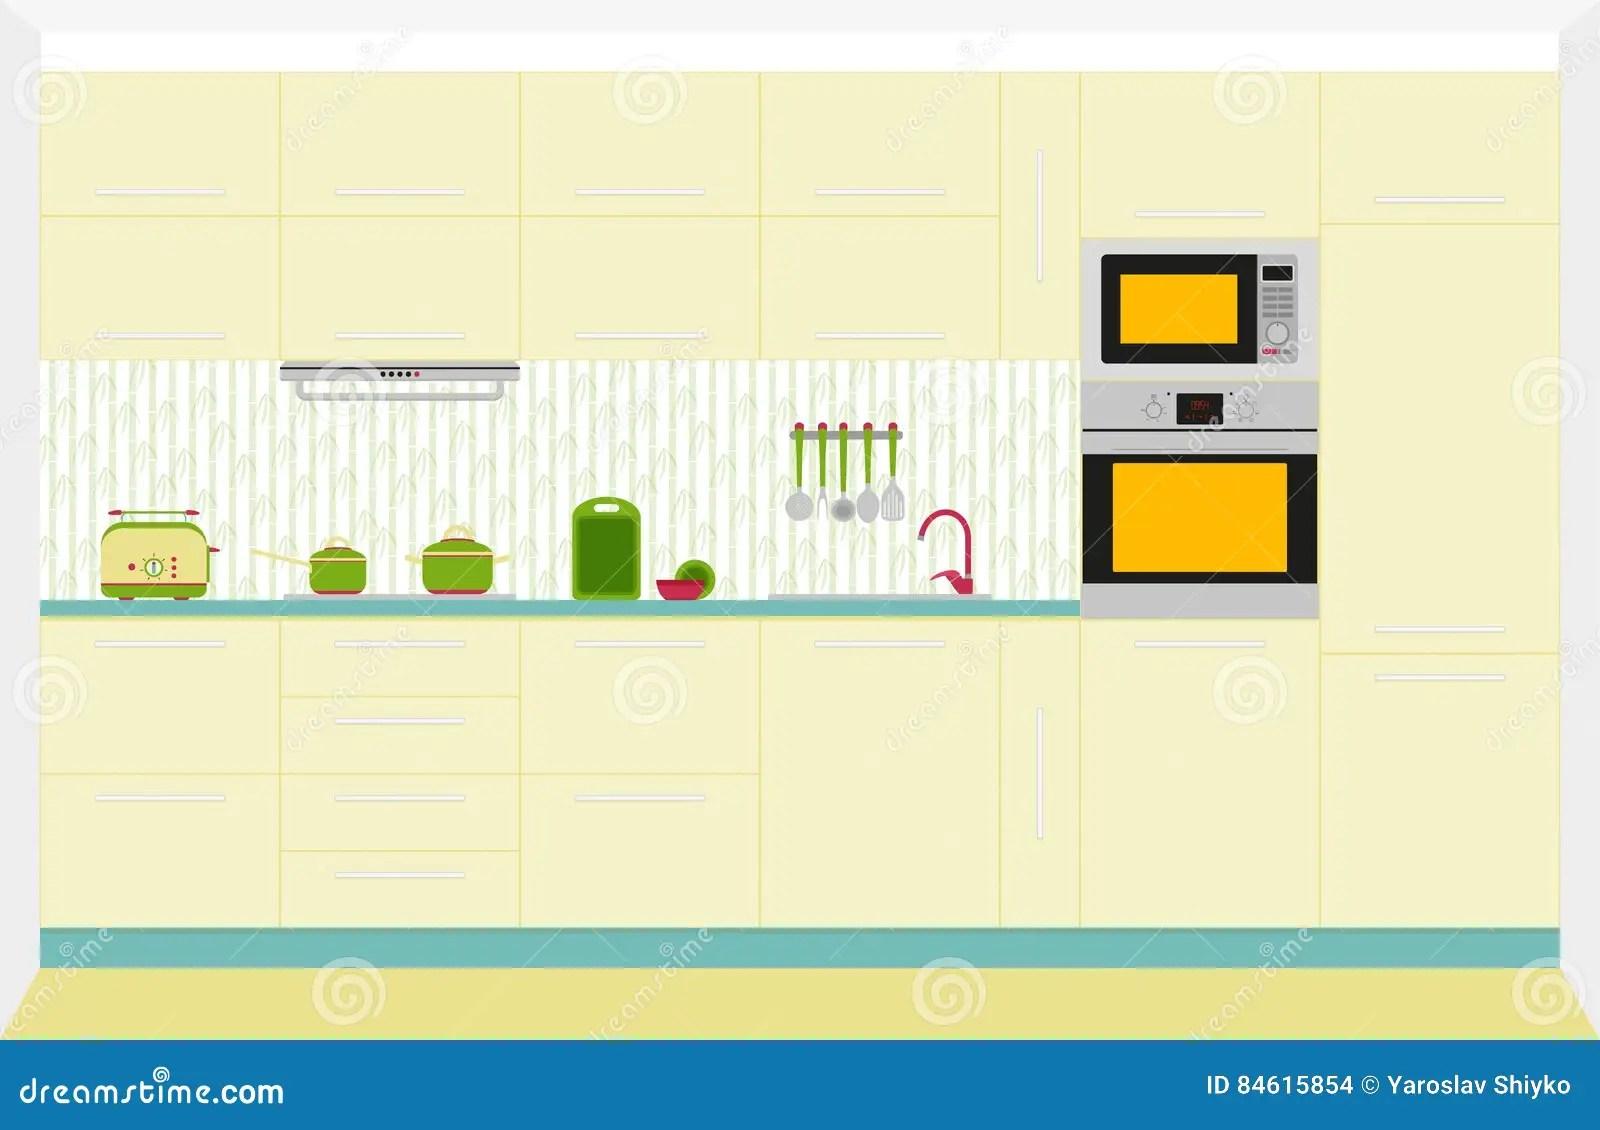 kitchen aid bowls renovation costs nj 设计内部厨房正面图向量例证 插画包括有背包 水壶 敞篷 想法 碗柜 设计内部厨房正面图